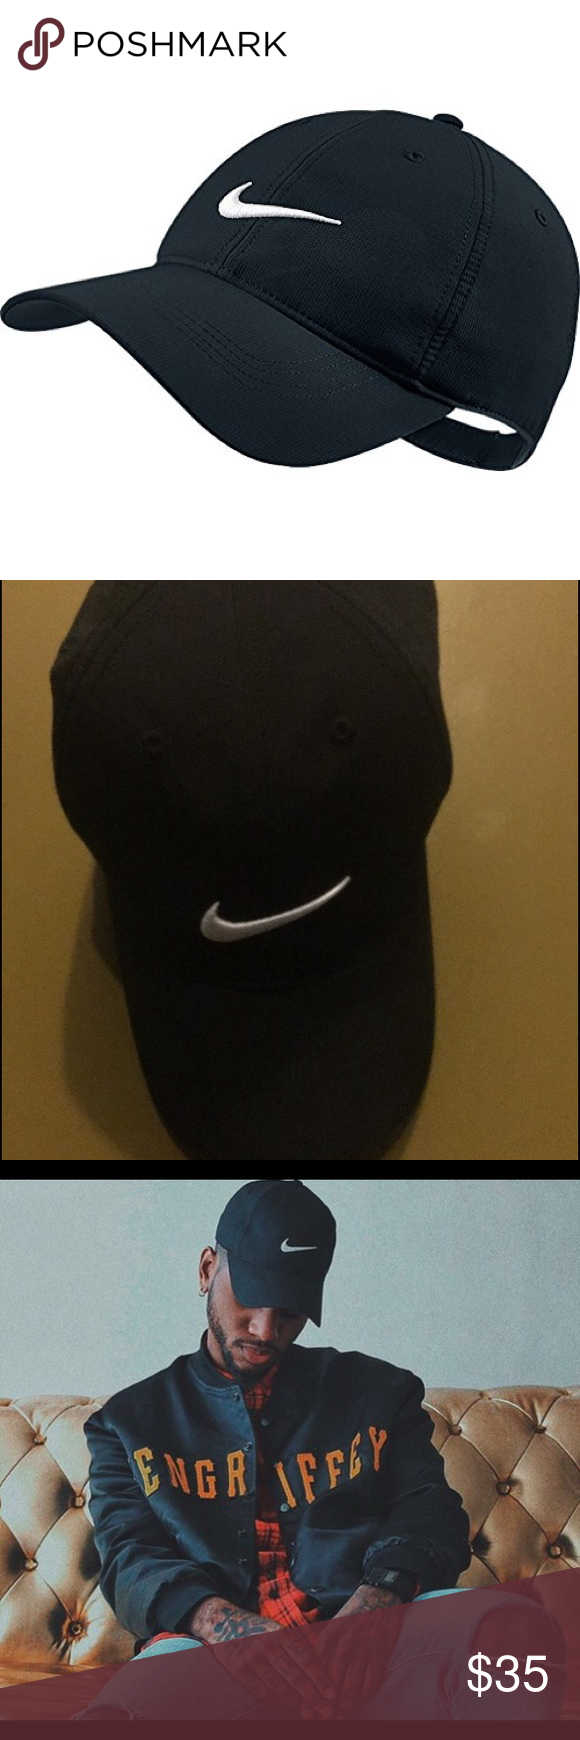 ... sale black white adjustable hat cap cap nike dri fit cap bryson tiller  b27d6 0fde3 1f9c871ffb23